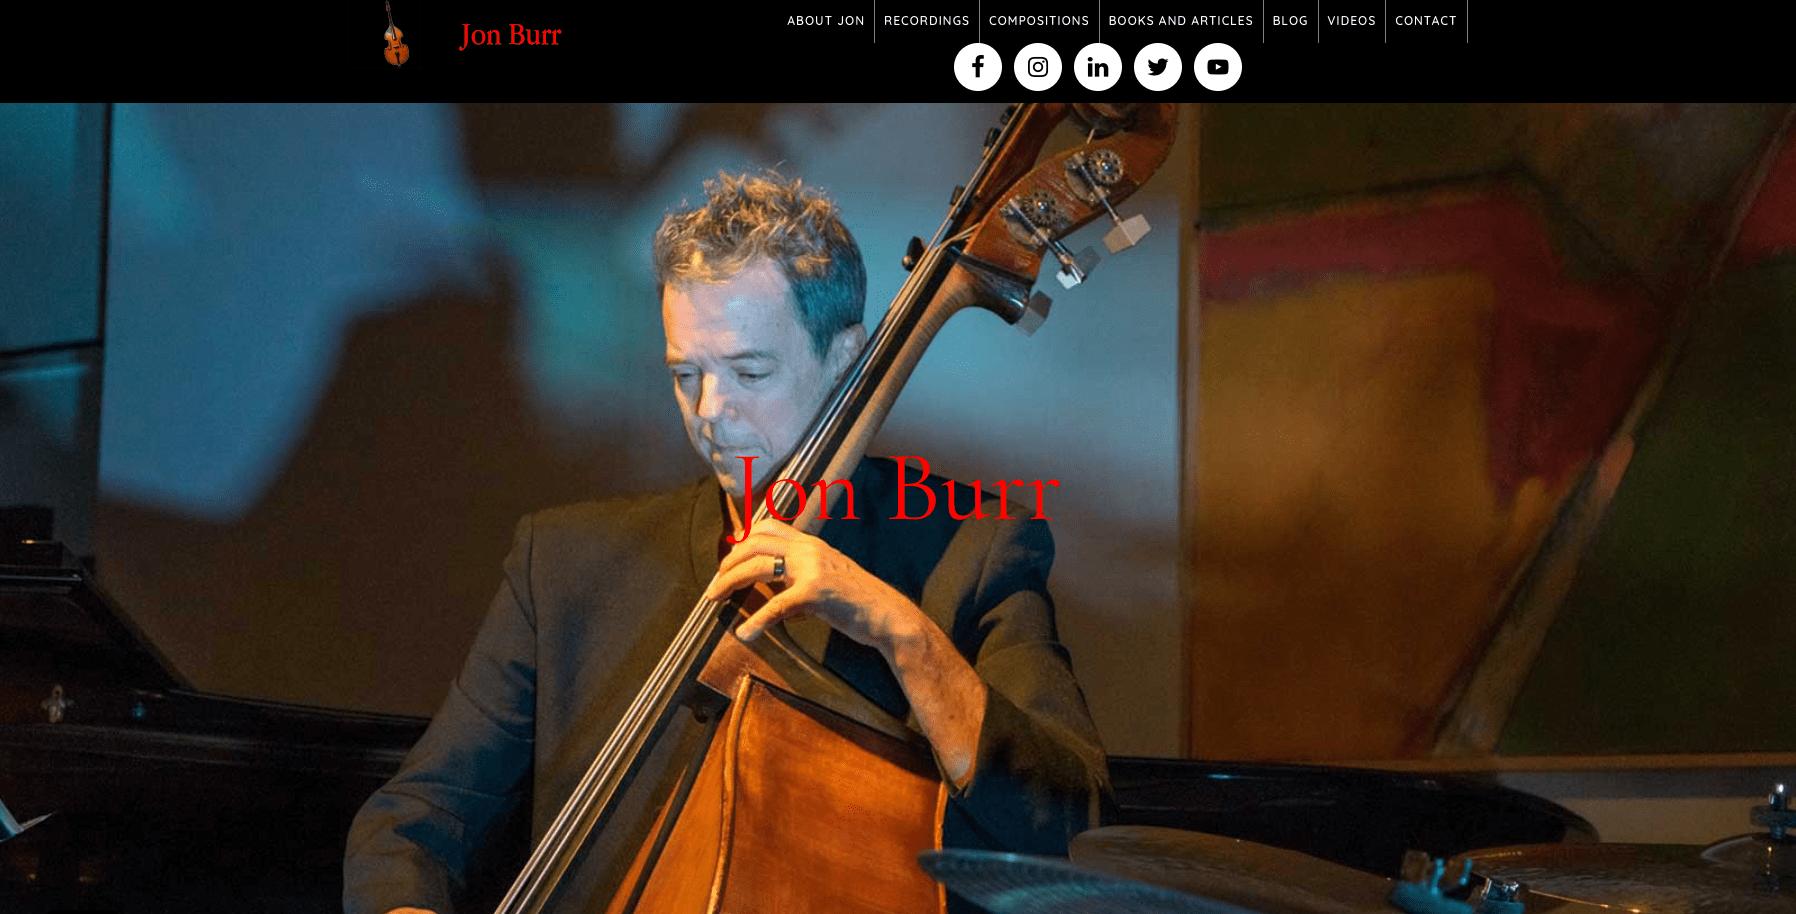 Jon Burr's Website